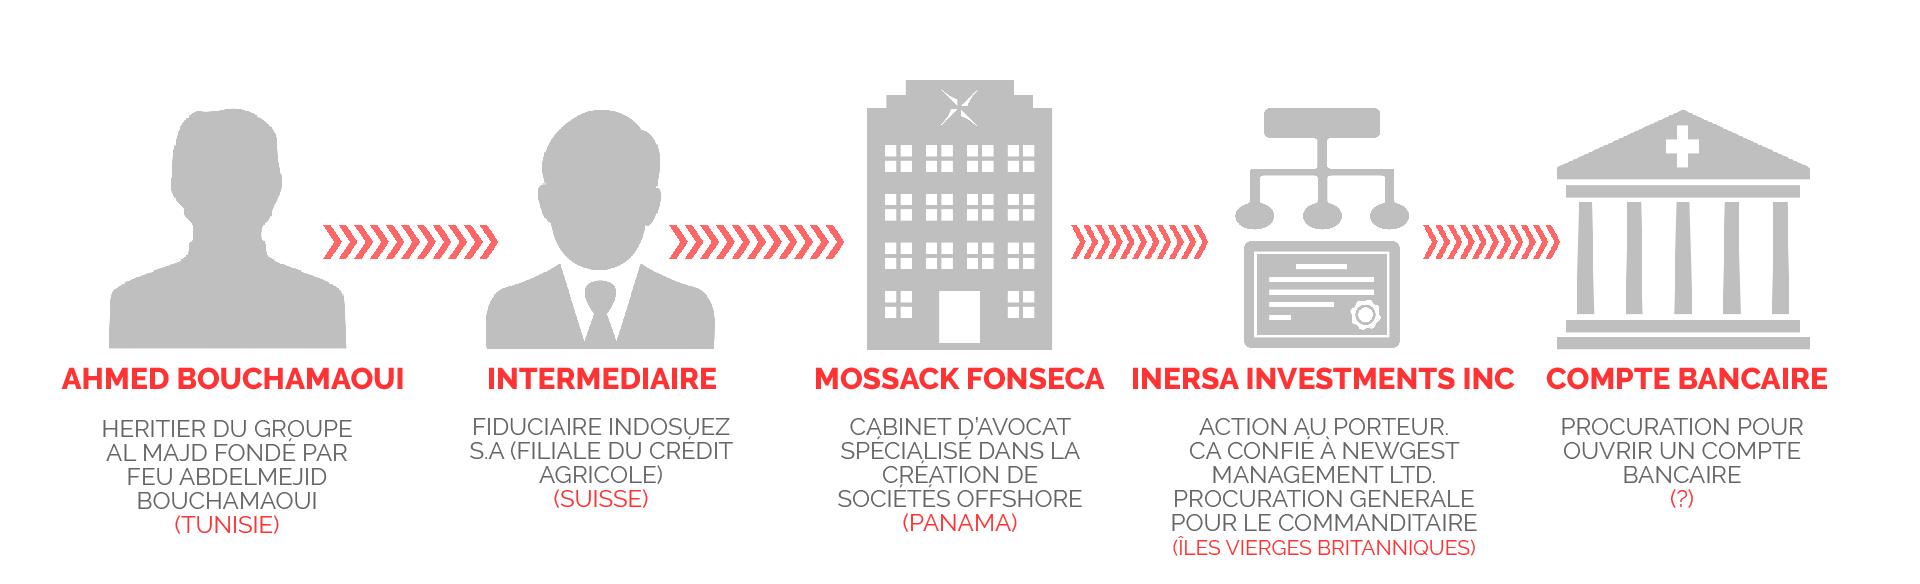 panamapapers-bouchamaoui-inersa-infographie-inkyfada